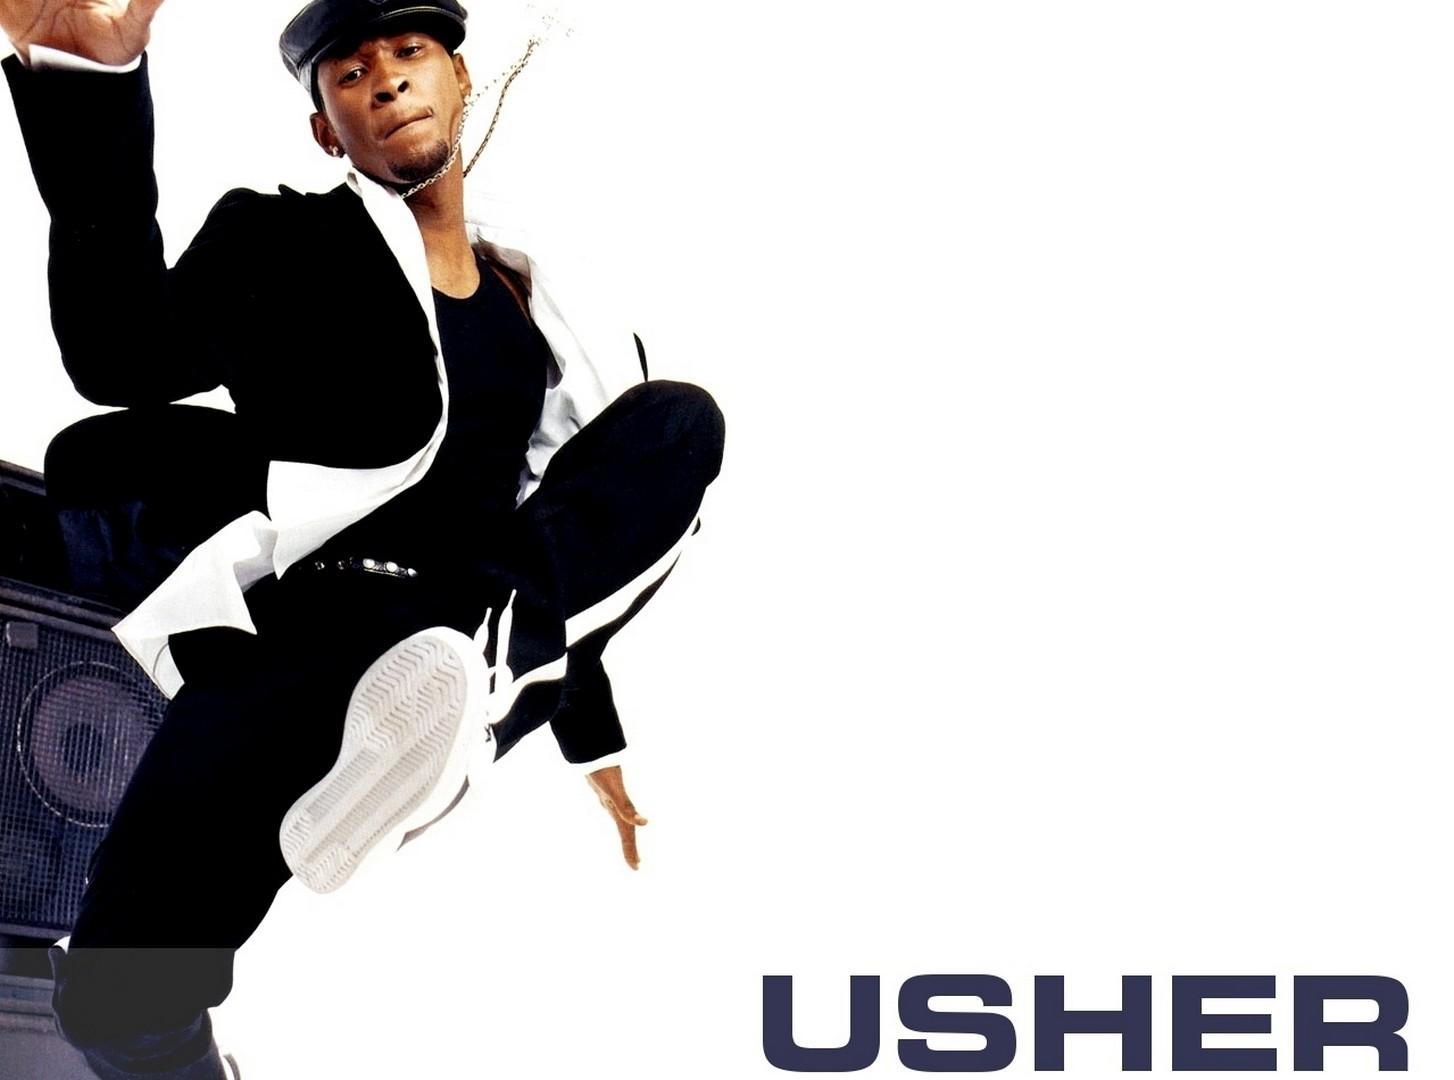 http://1.bp.blogspot.com/-sSJ2yP8ykUs/Tbdg8-R1rTI/AAAAAAAAAbg/8O0f77SfOj8/s1600/Usher-pics-Usher-Usher-Usher-Usher-Usher-Usher-Usher-Usher-Usher-Usher.jpg